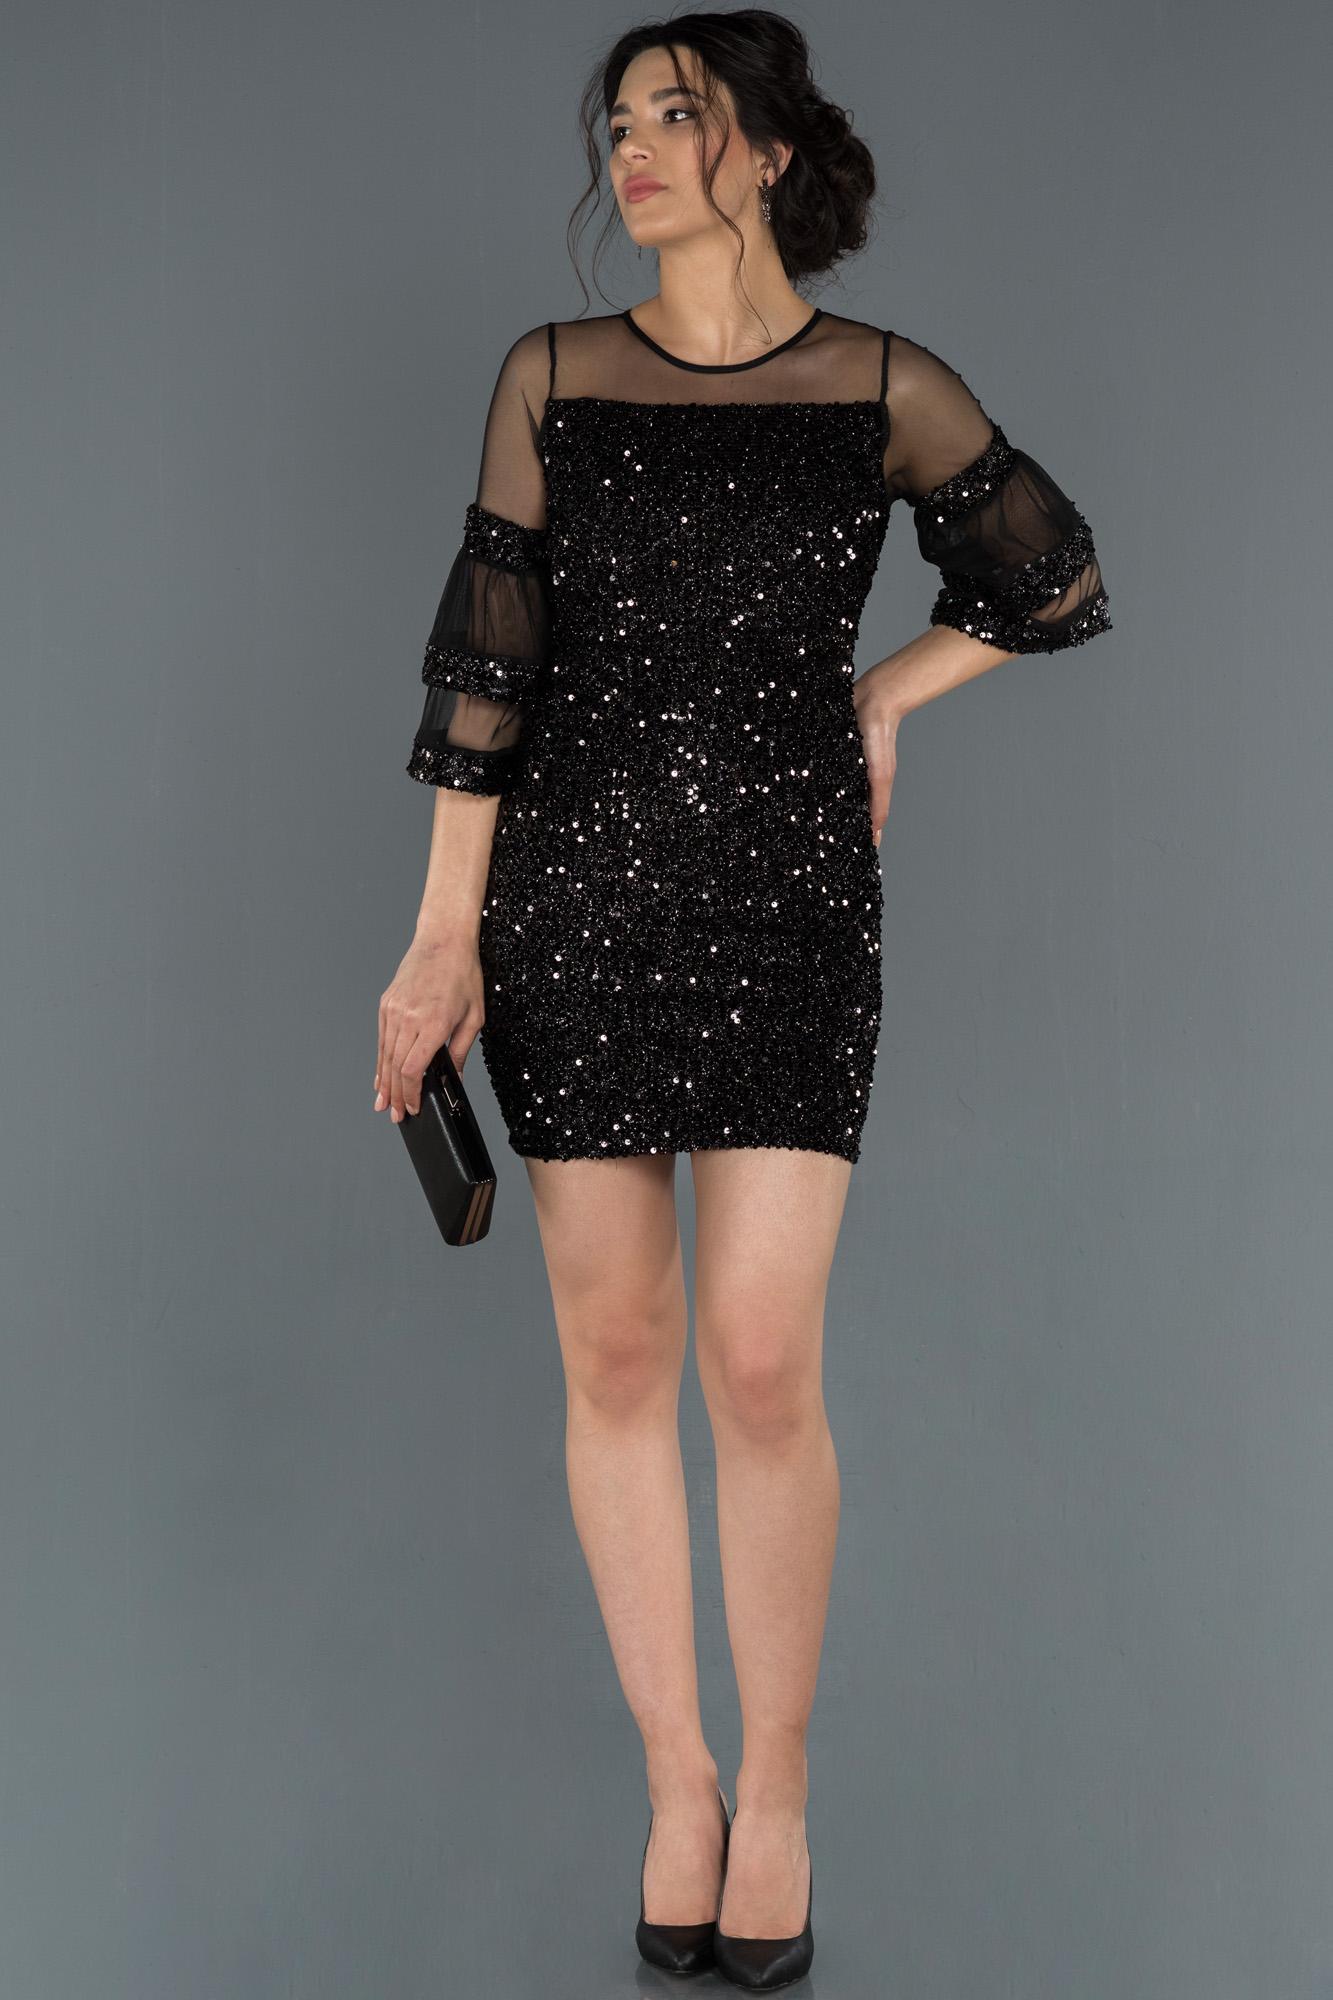 Siyah Kısa Pullu Davet Elbisesi